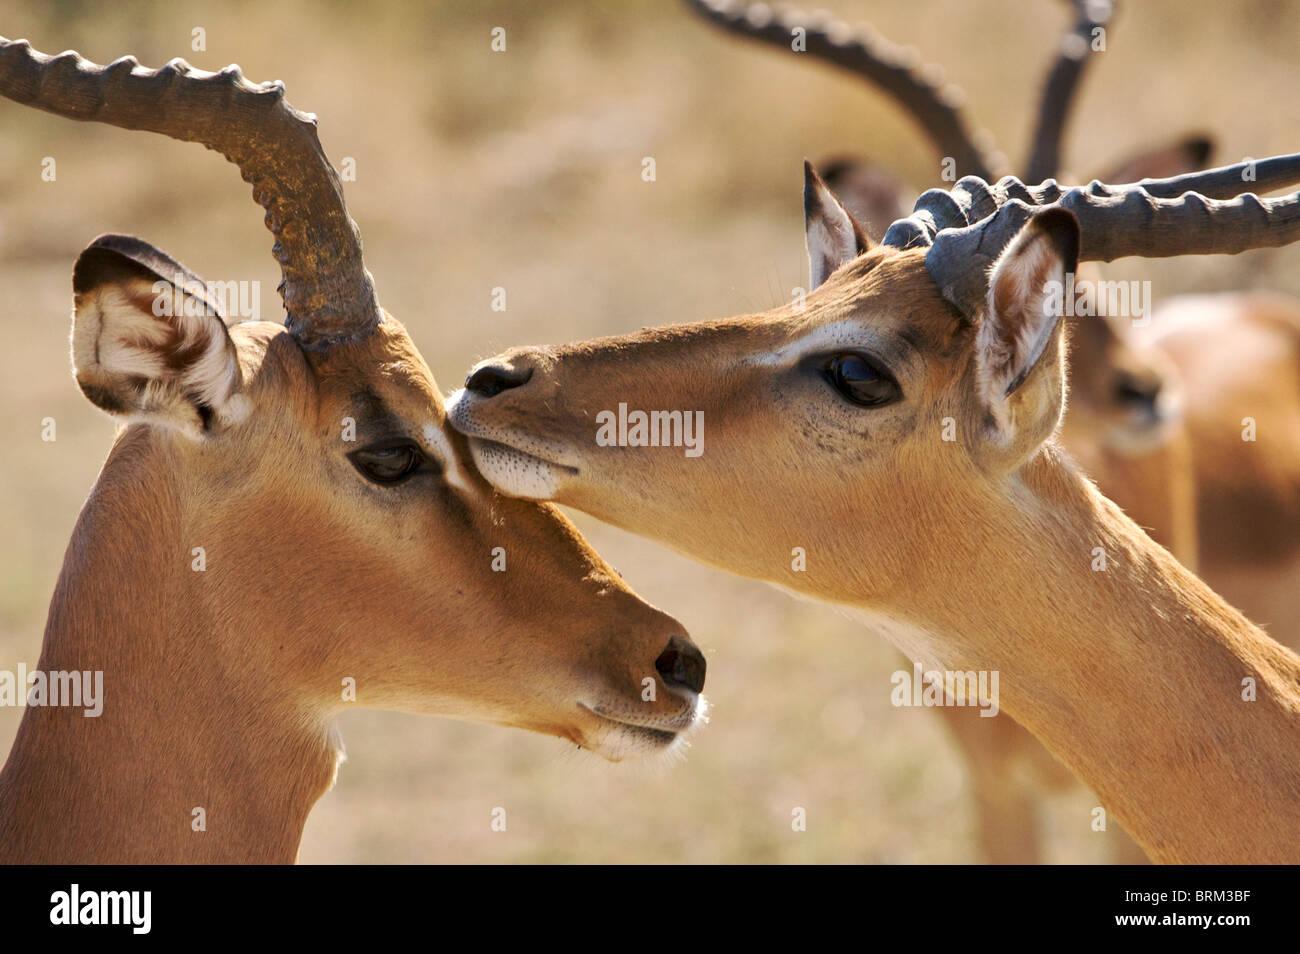 Male Impala touch during rutting season Stock Photo